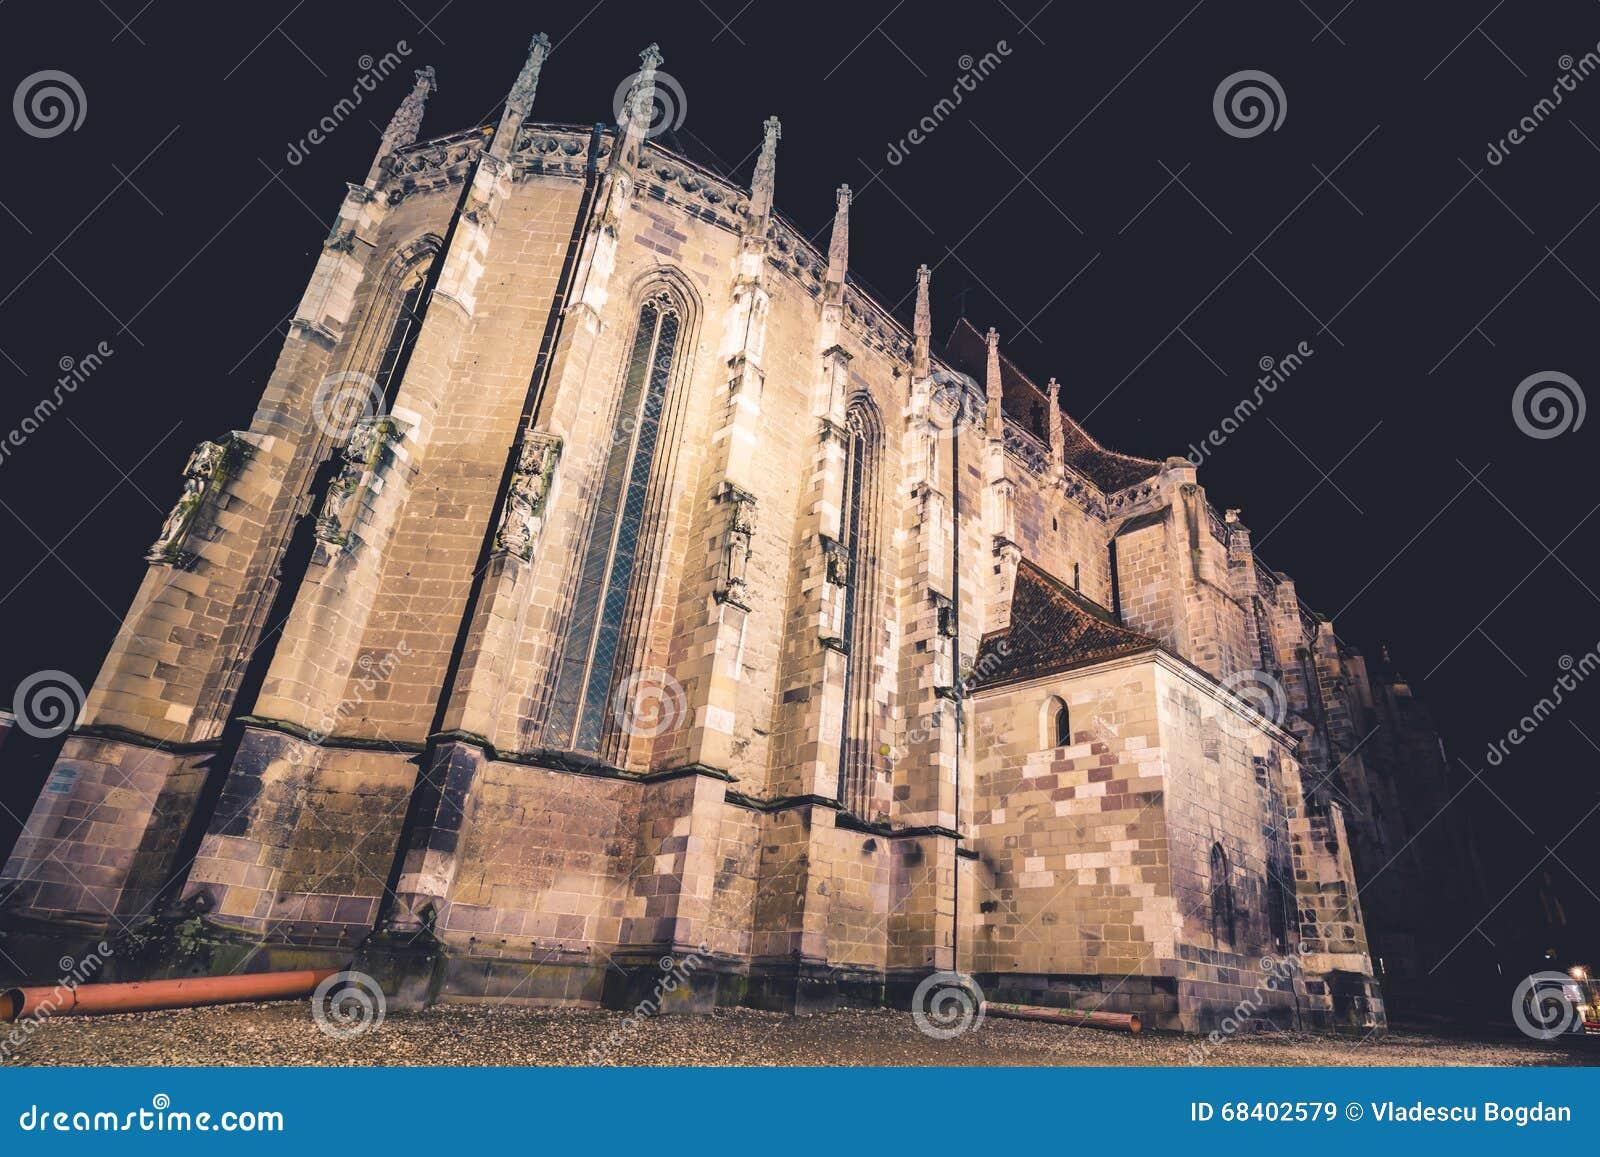 Black church by night brasov romania stock image - Romanian architectural styles ...